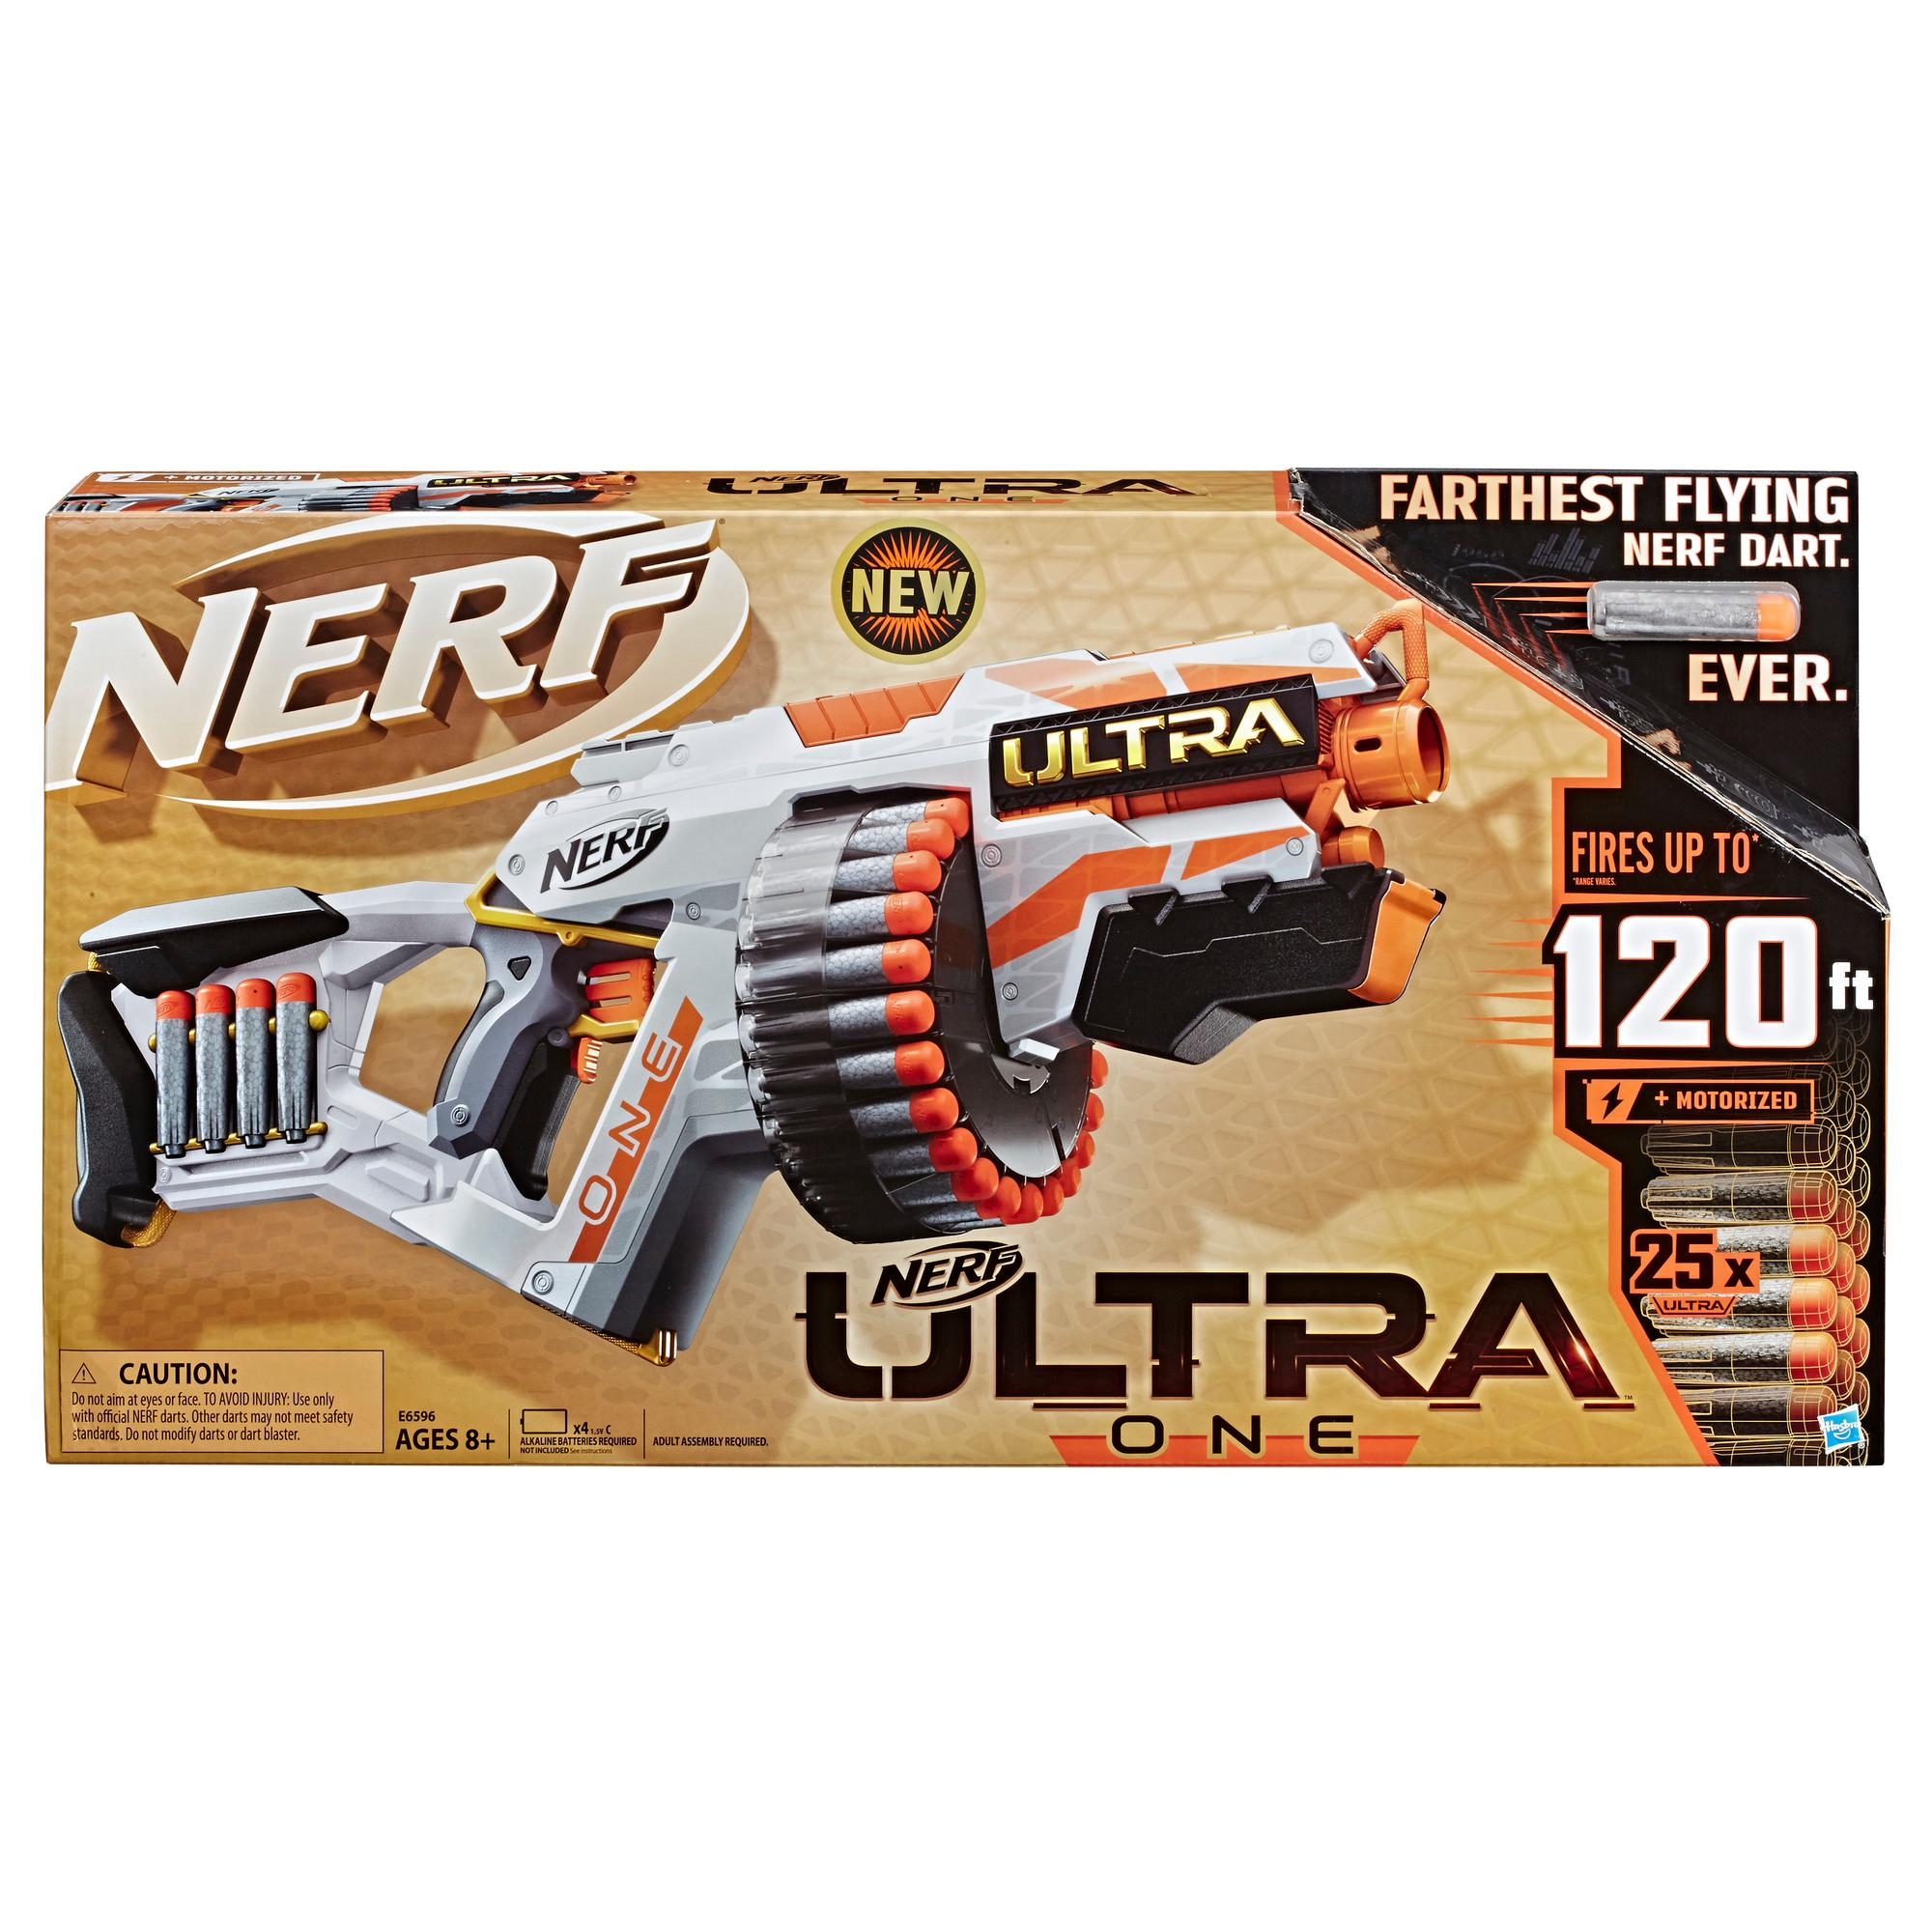 NERFウルトラワン・モーター付きブラスター、25本のNERFウルトラダーツ -- NERFウルトラワンダーツに限り互換性あり